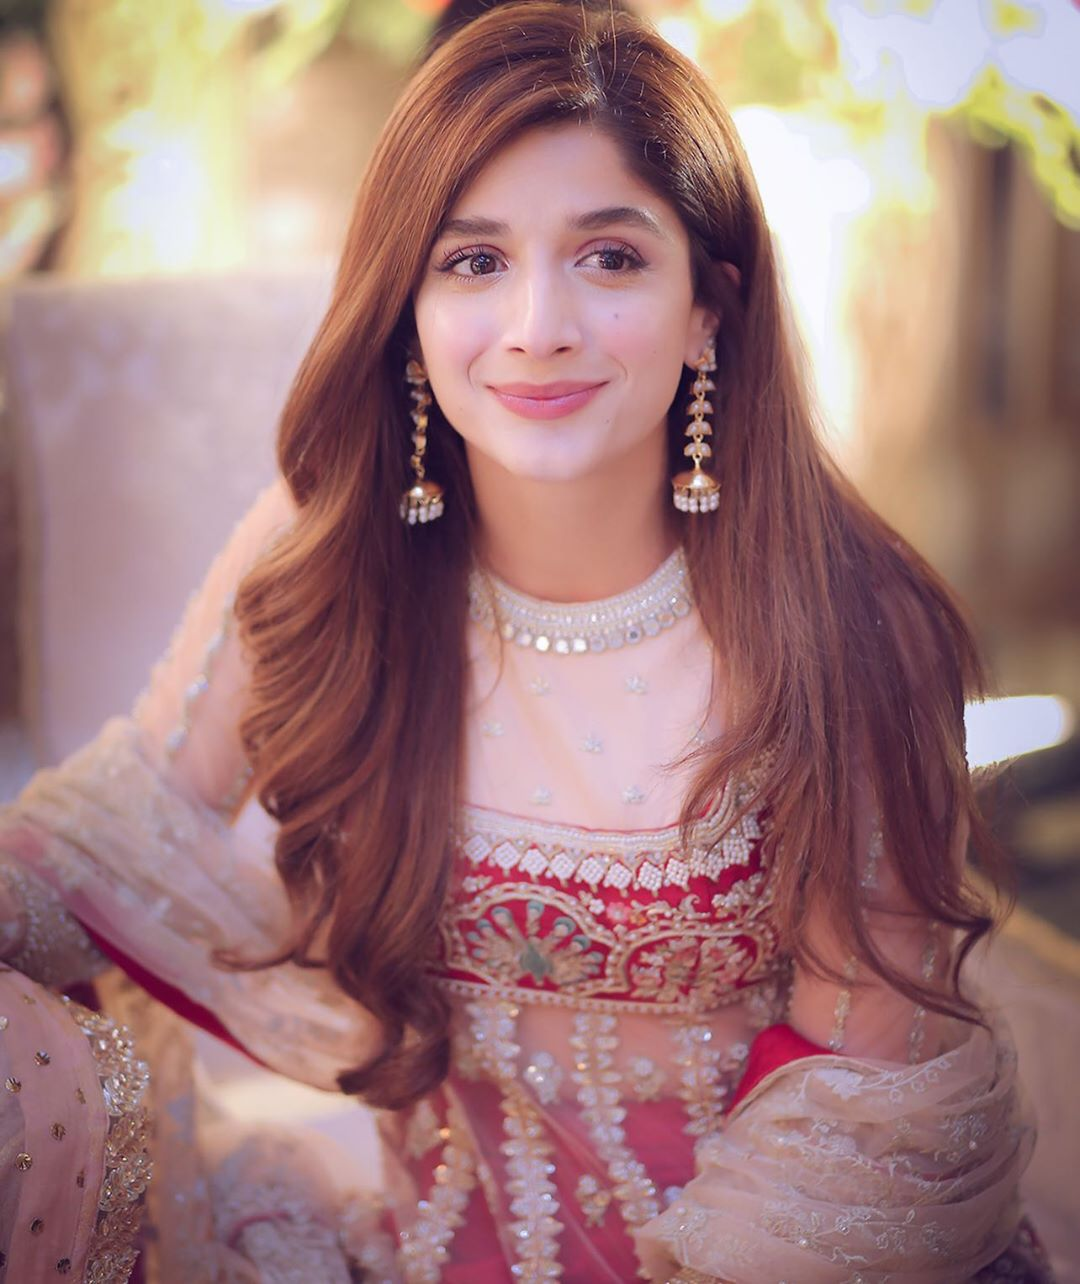 Mawra Hocane, Feroze Khan will share screen space in Yasir Nawaz's film Chakkar